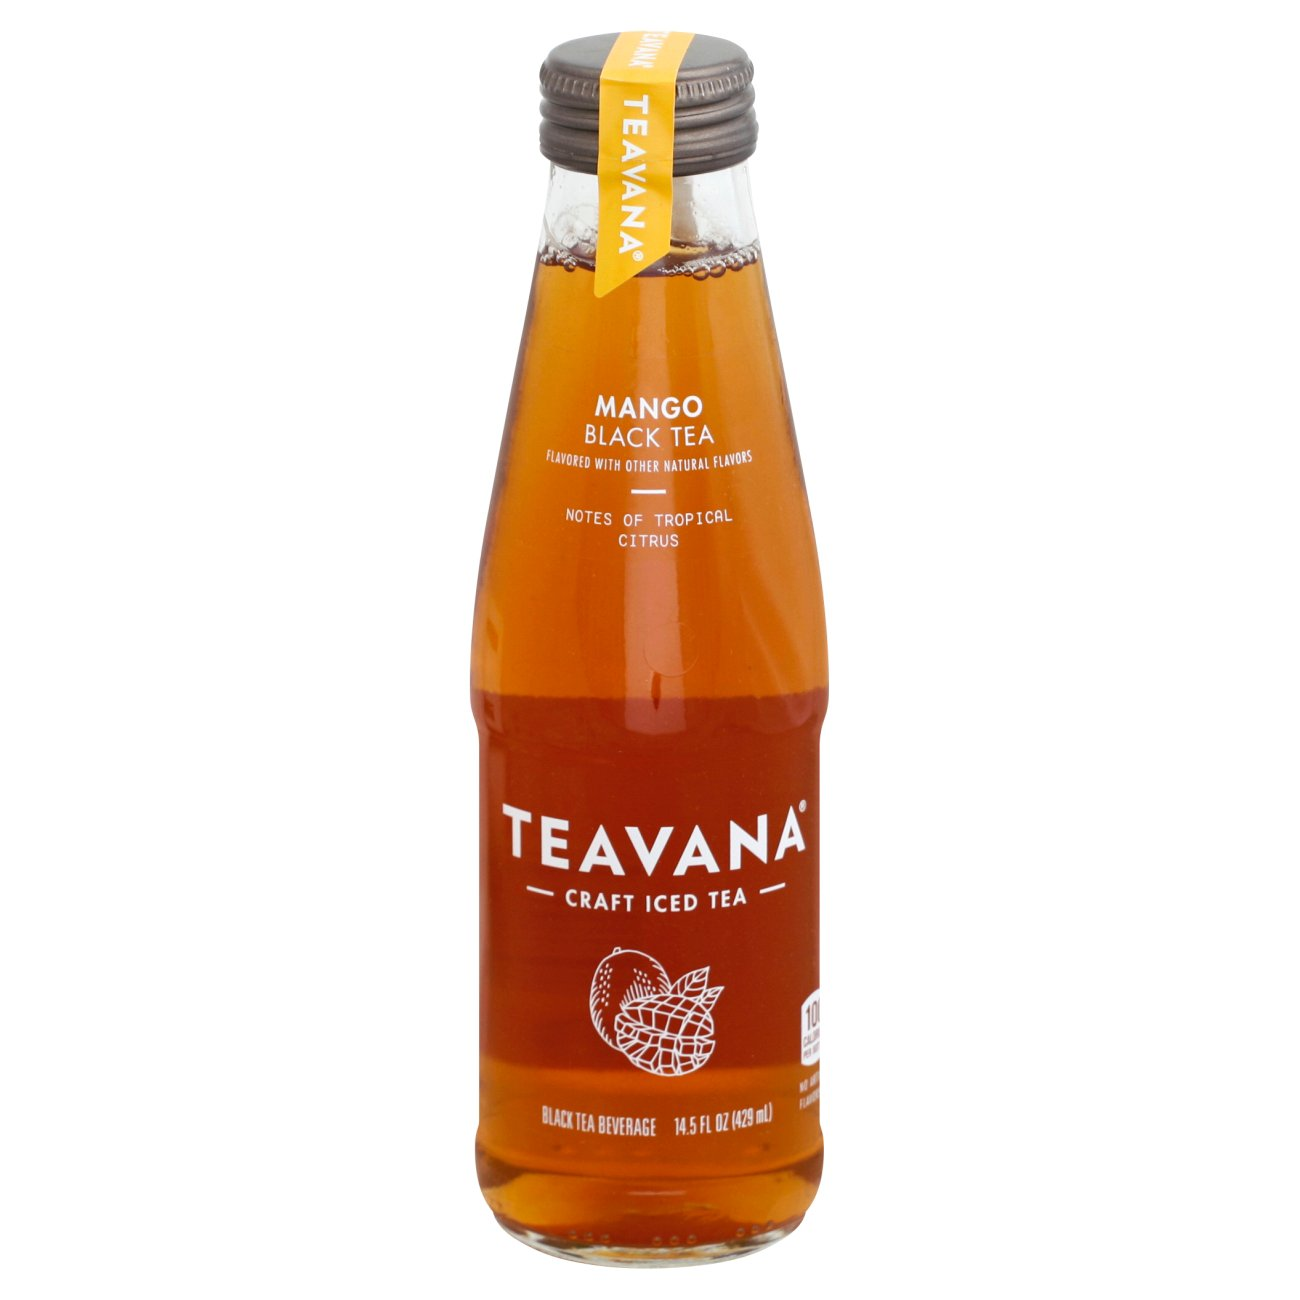 Teavana Mango Black Tea - Shop Tea at H-E-B